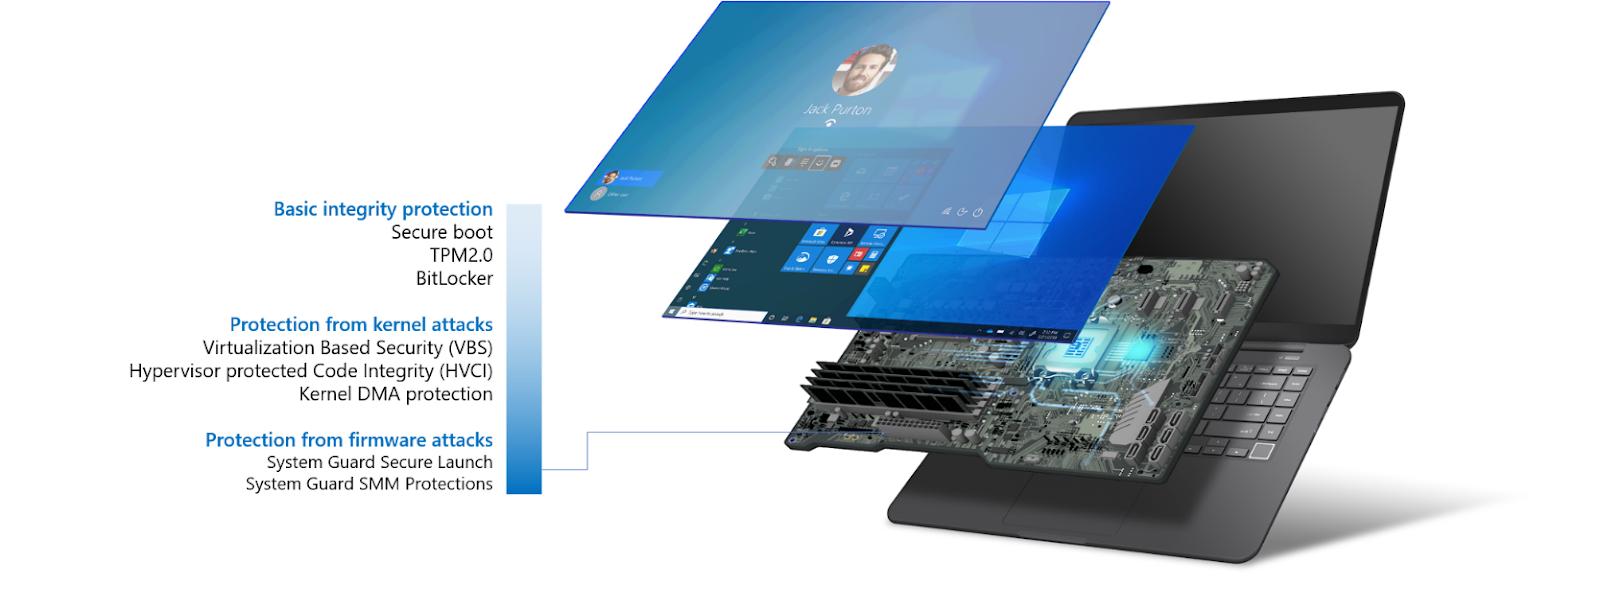 Windows-10-Secured-core